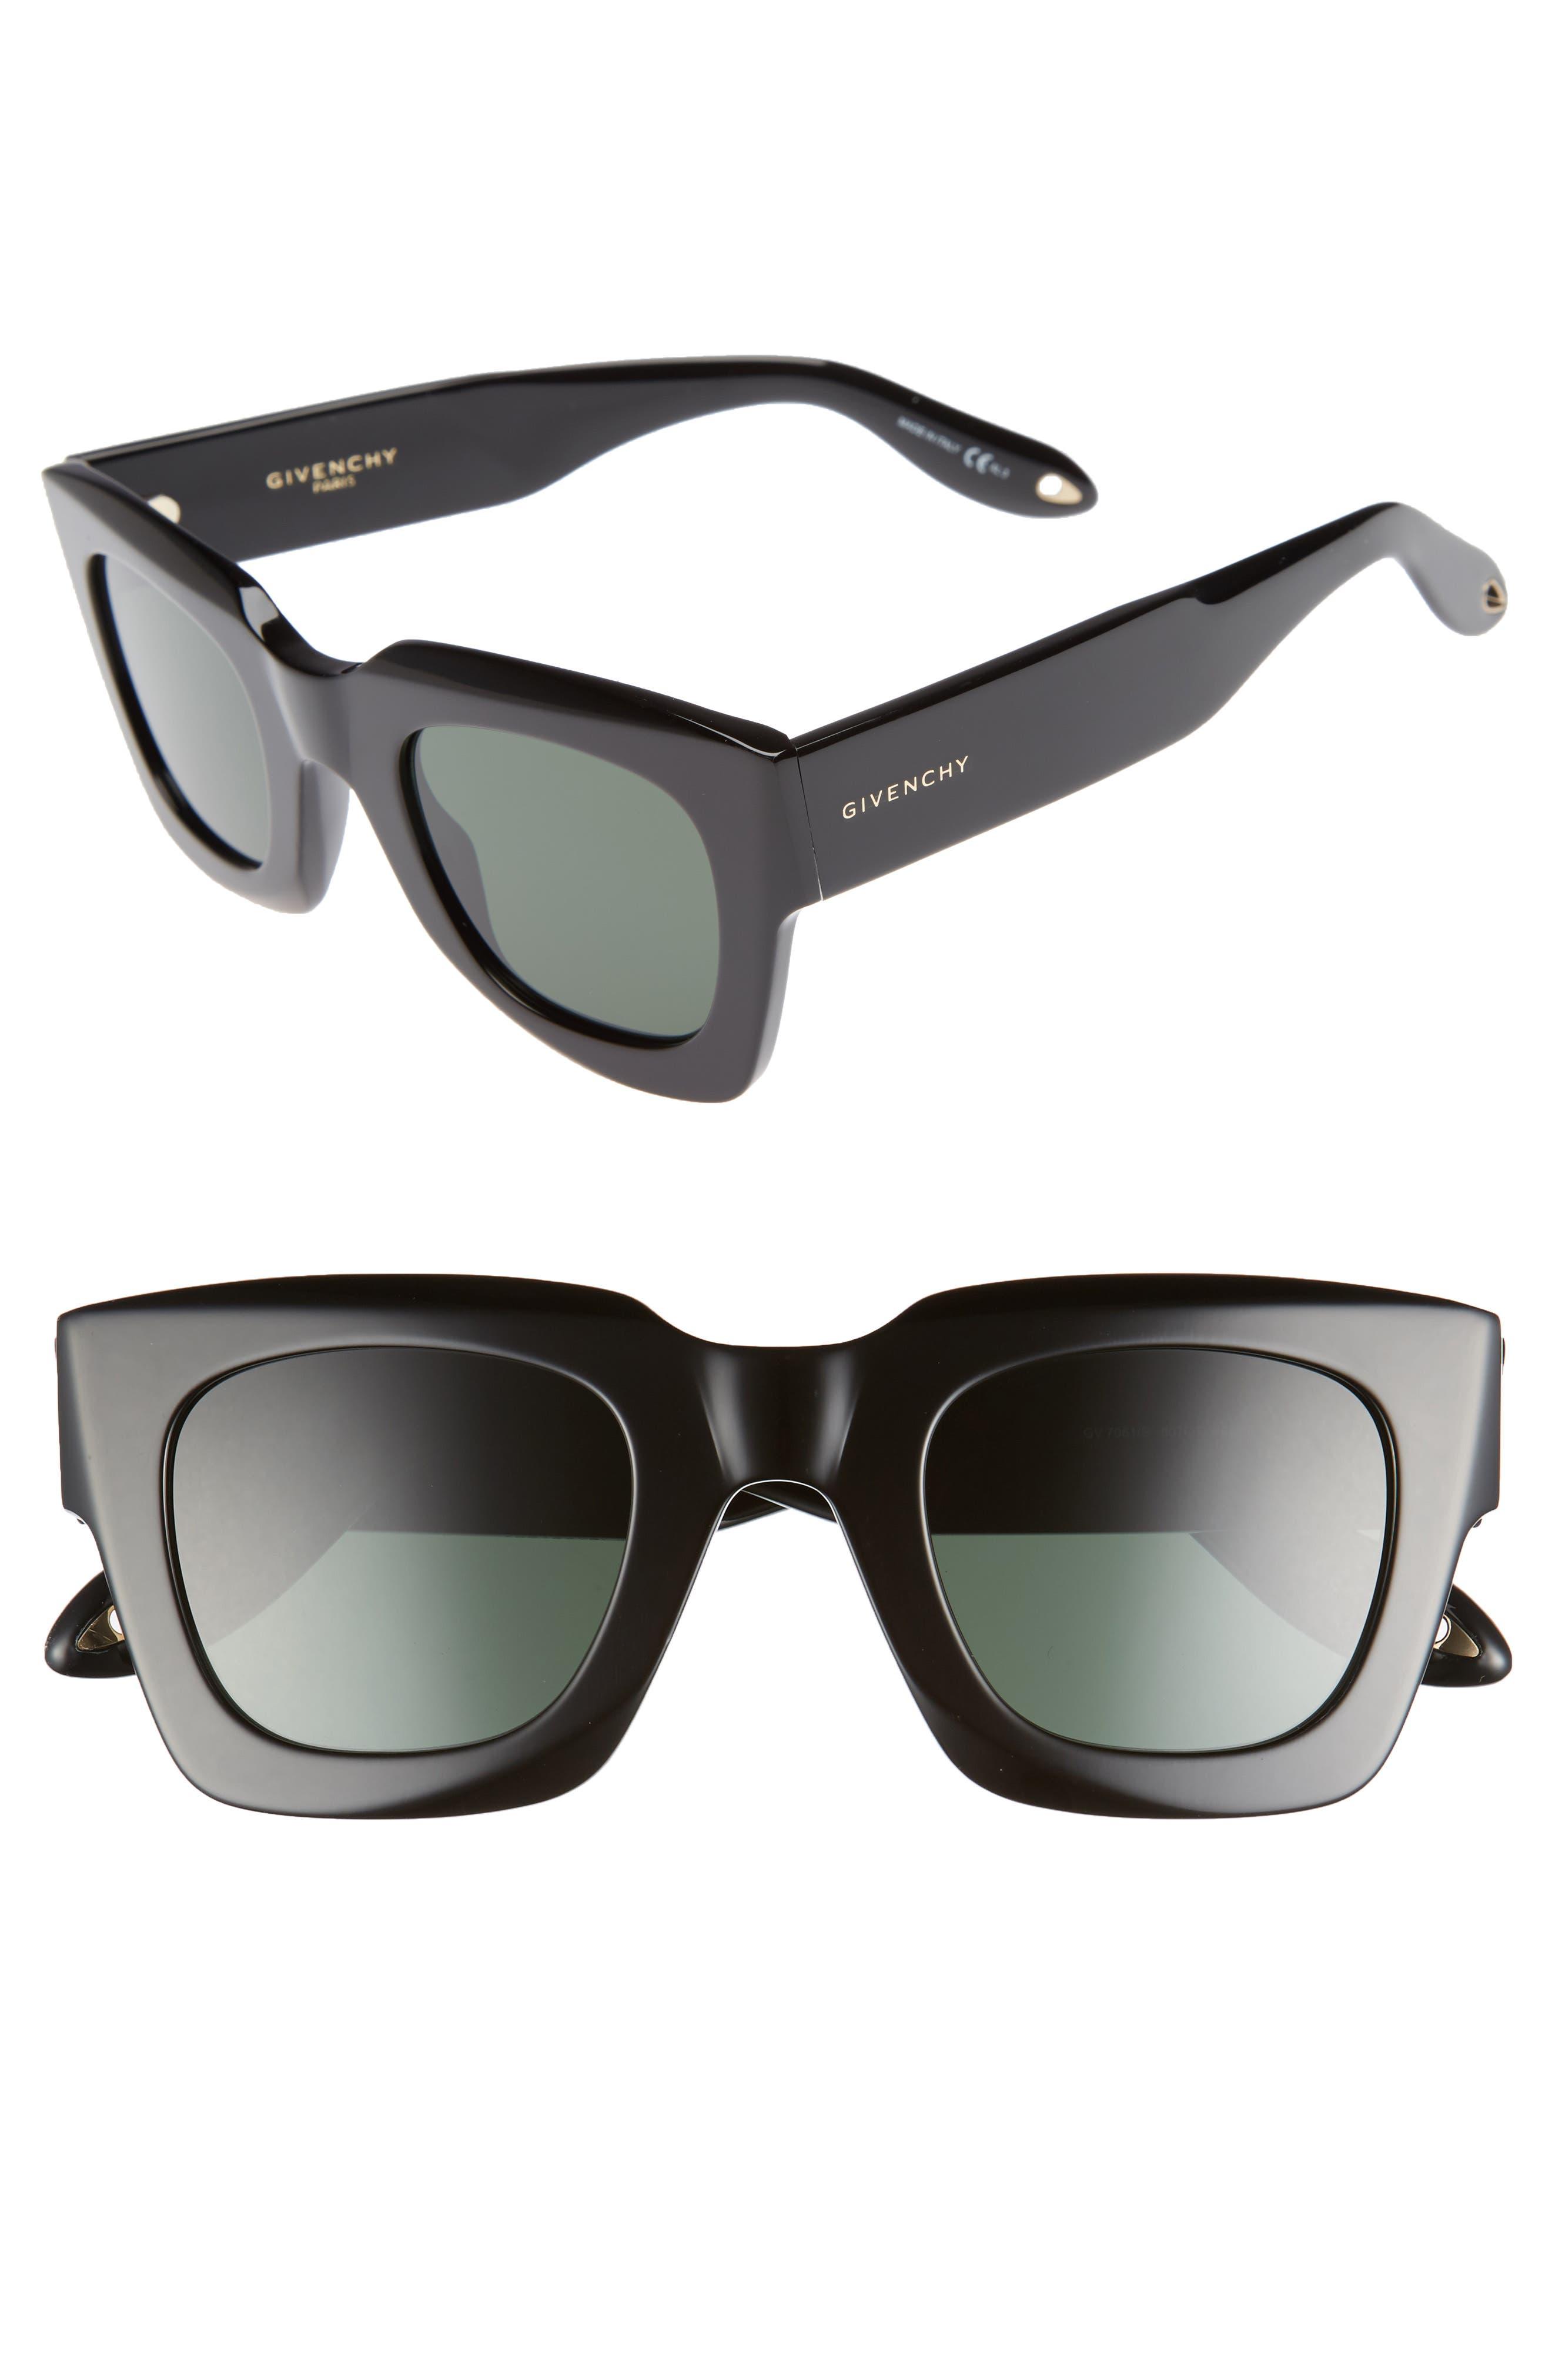 48mm Square Sunglasses,                         Main,                         color, Black